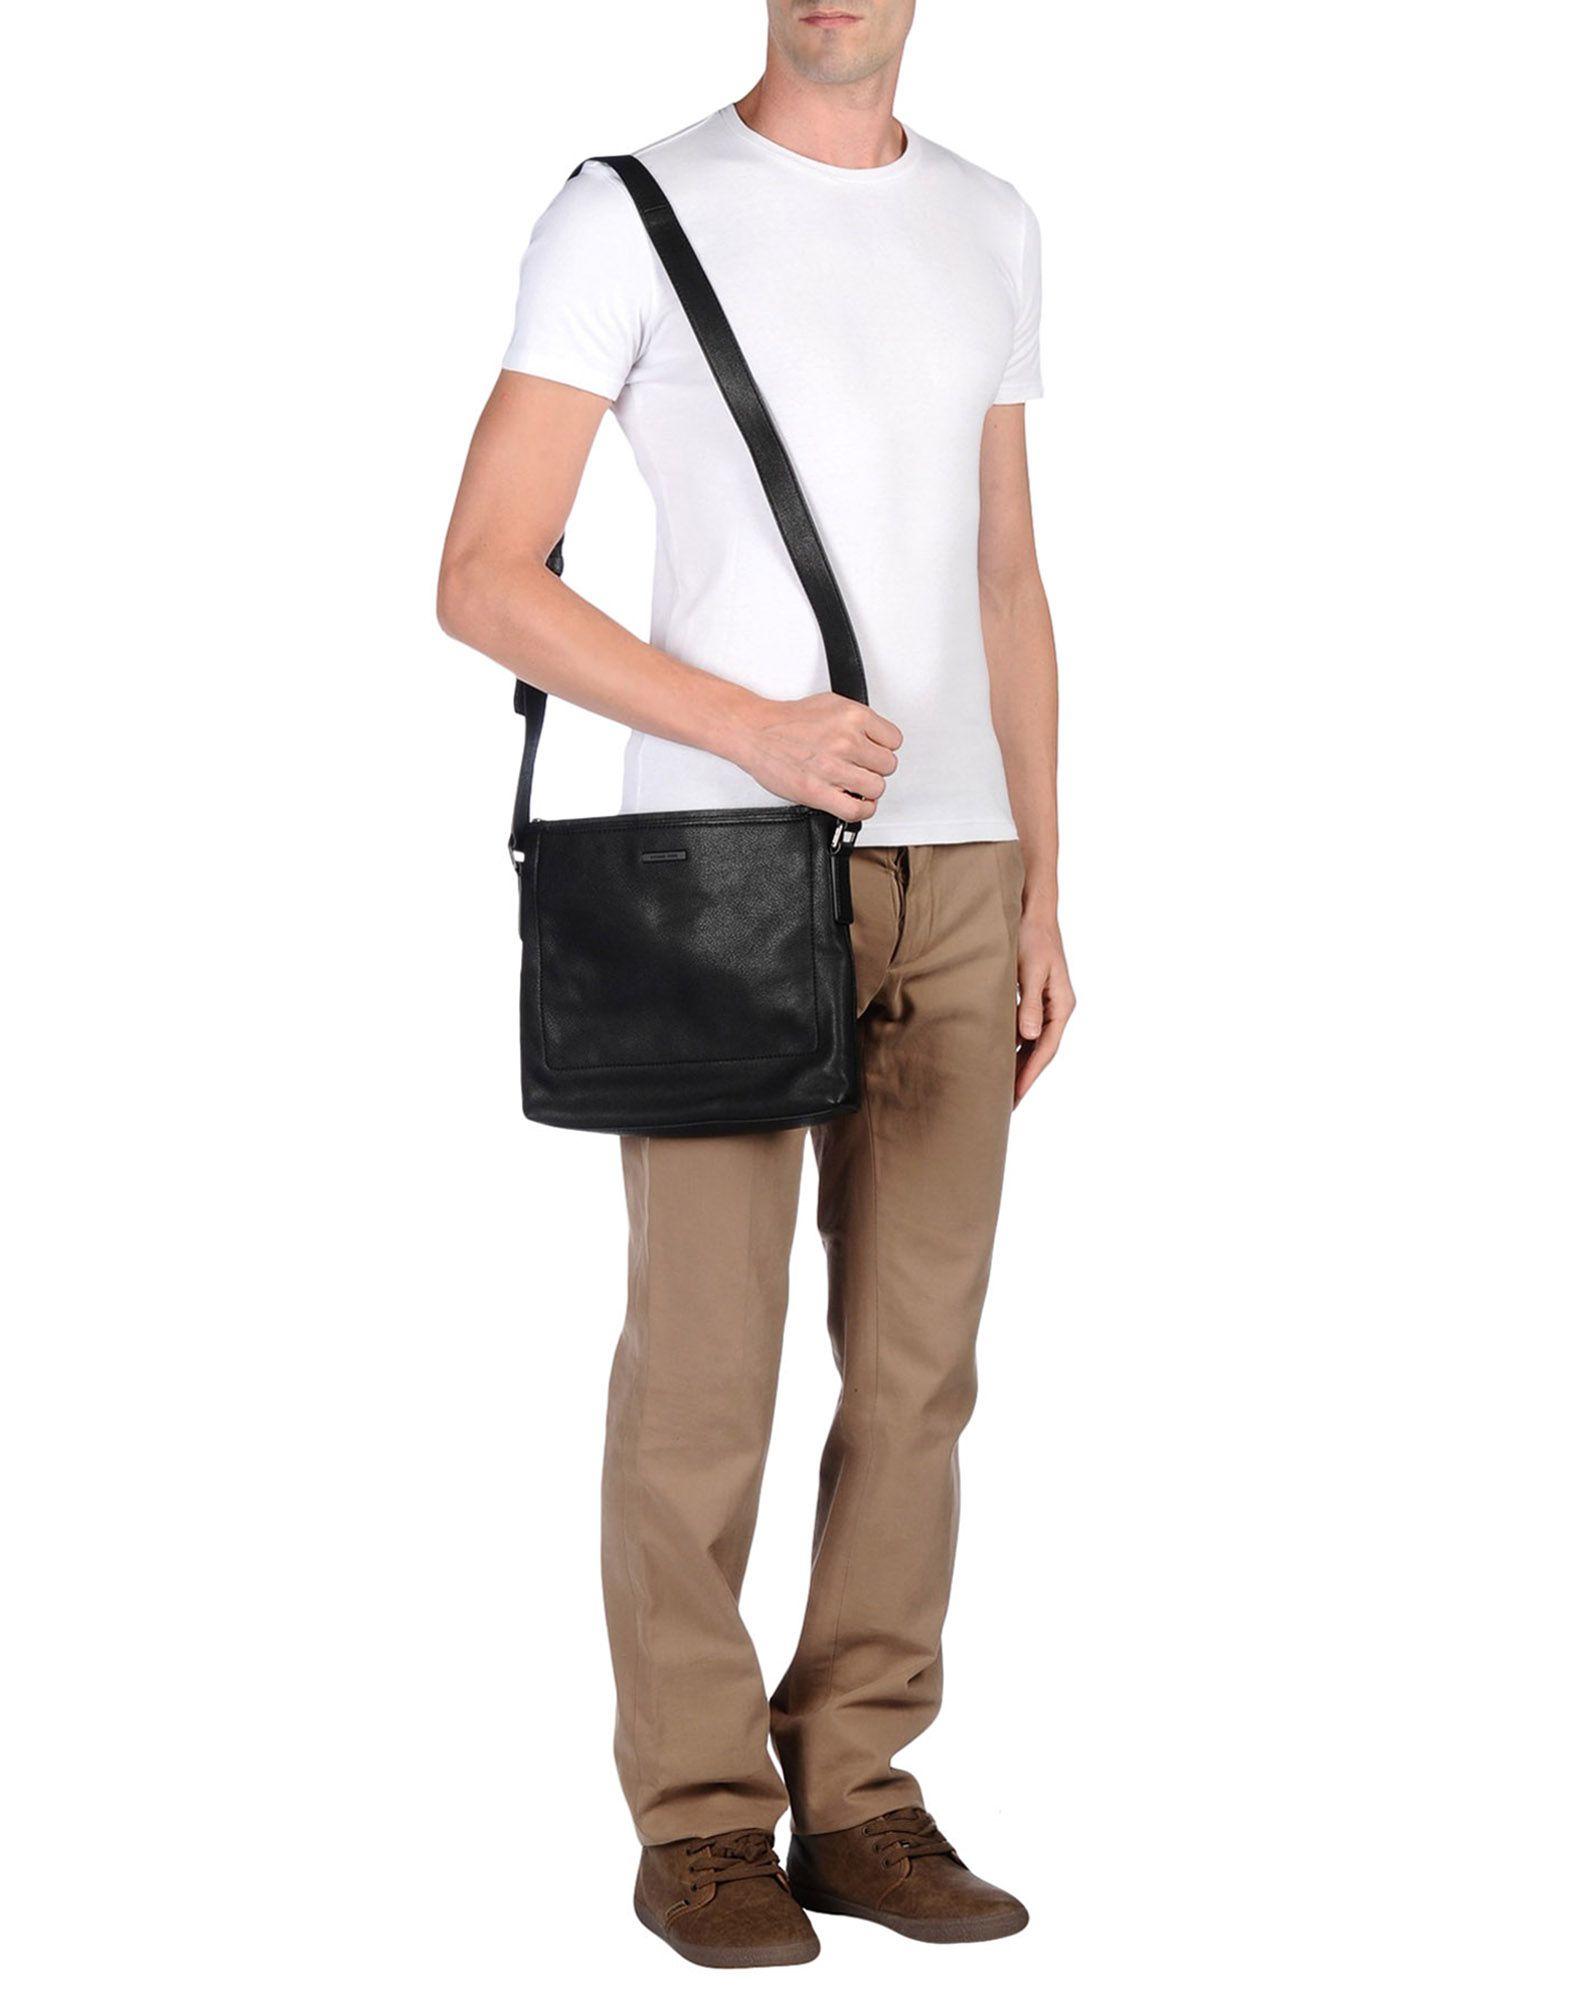 82427f404fa6 Michael Kors Cross-body Bag in Black for Men - Lyst